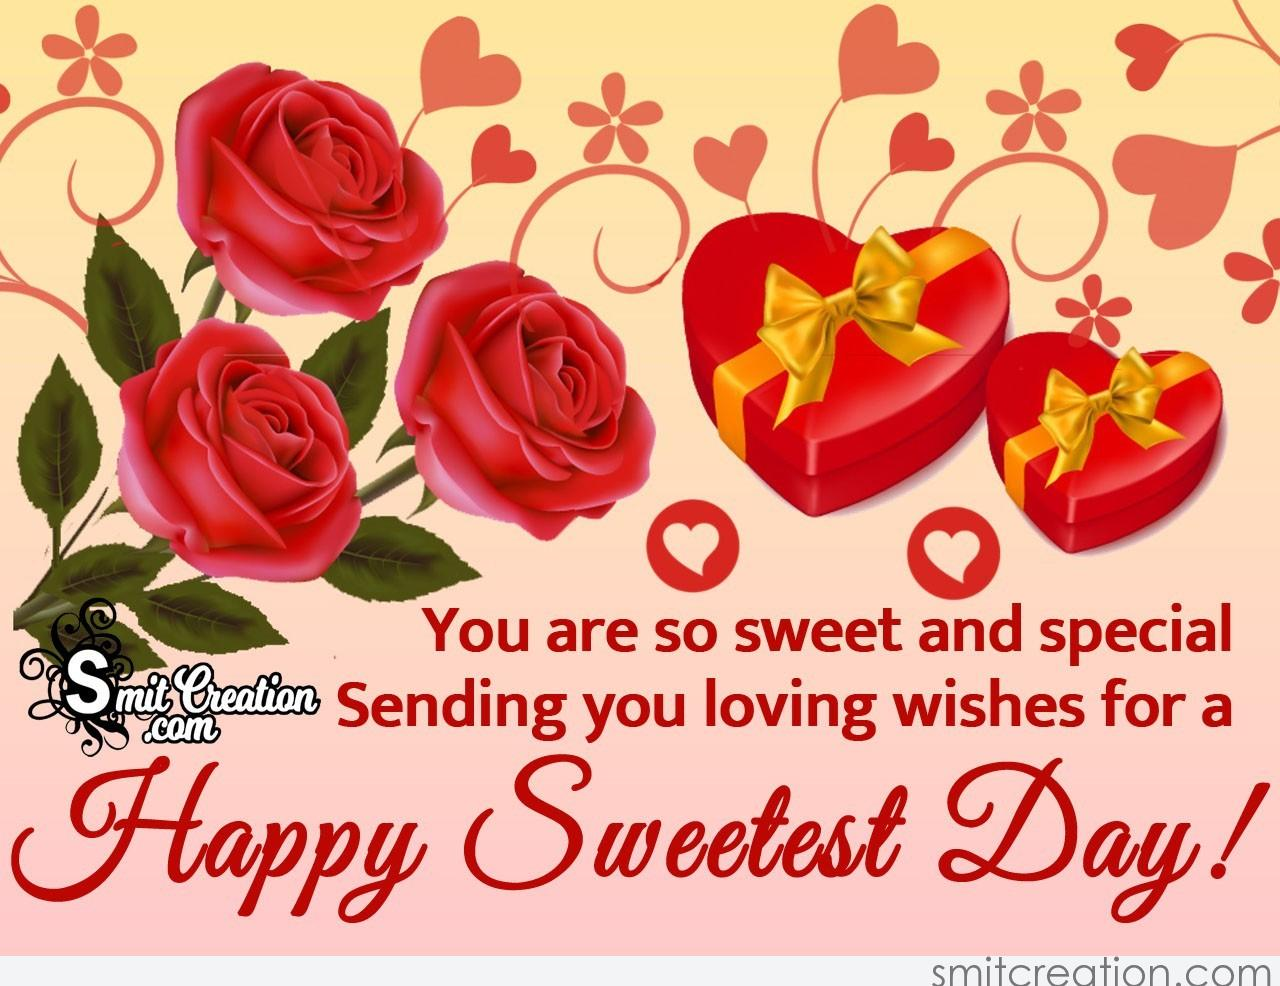 Sending Happy Sweetest Day Wishes Smitcreation